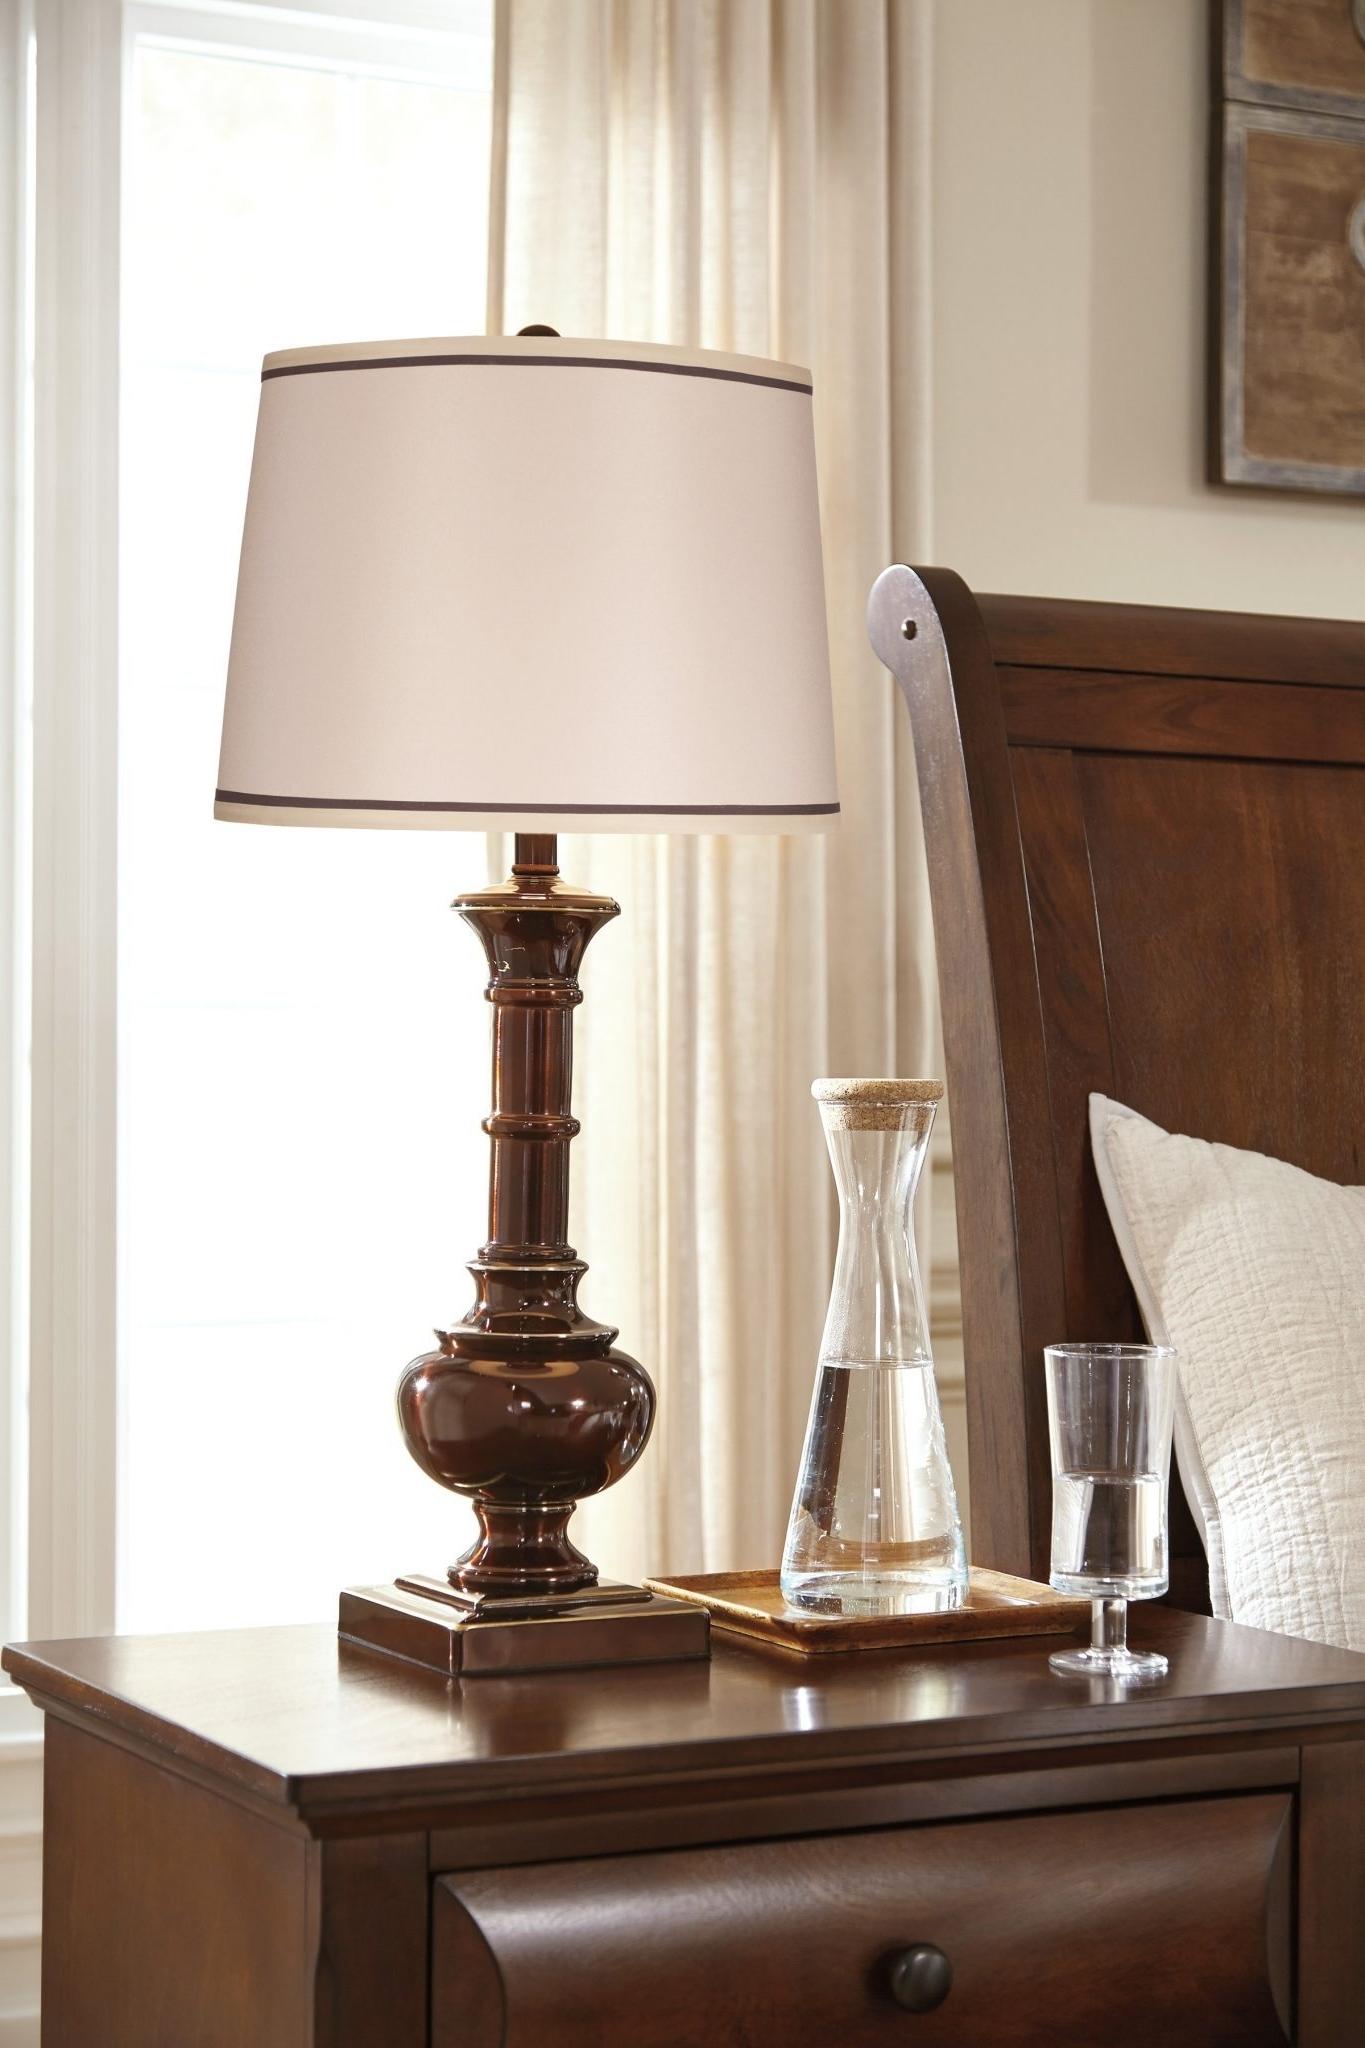 65 Most Killer Elegant Table Lamps Modern For Living Room Regarding Most Popular Bronze Living Room Table Lamps (View 3 of 15)